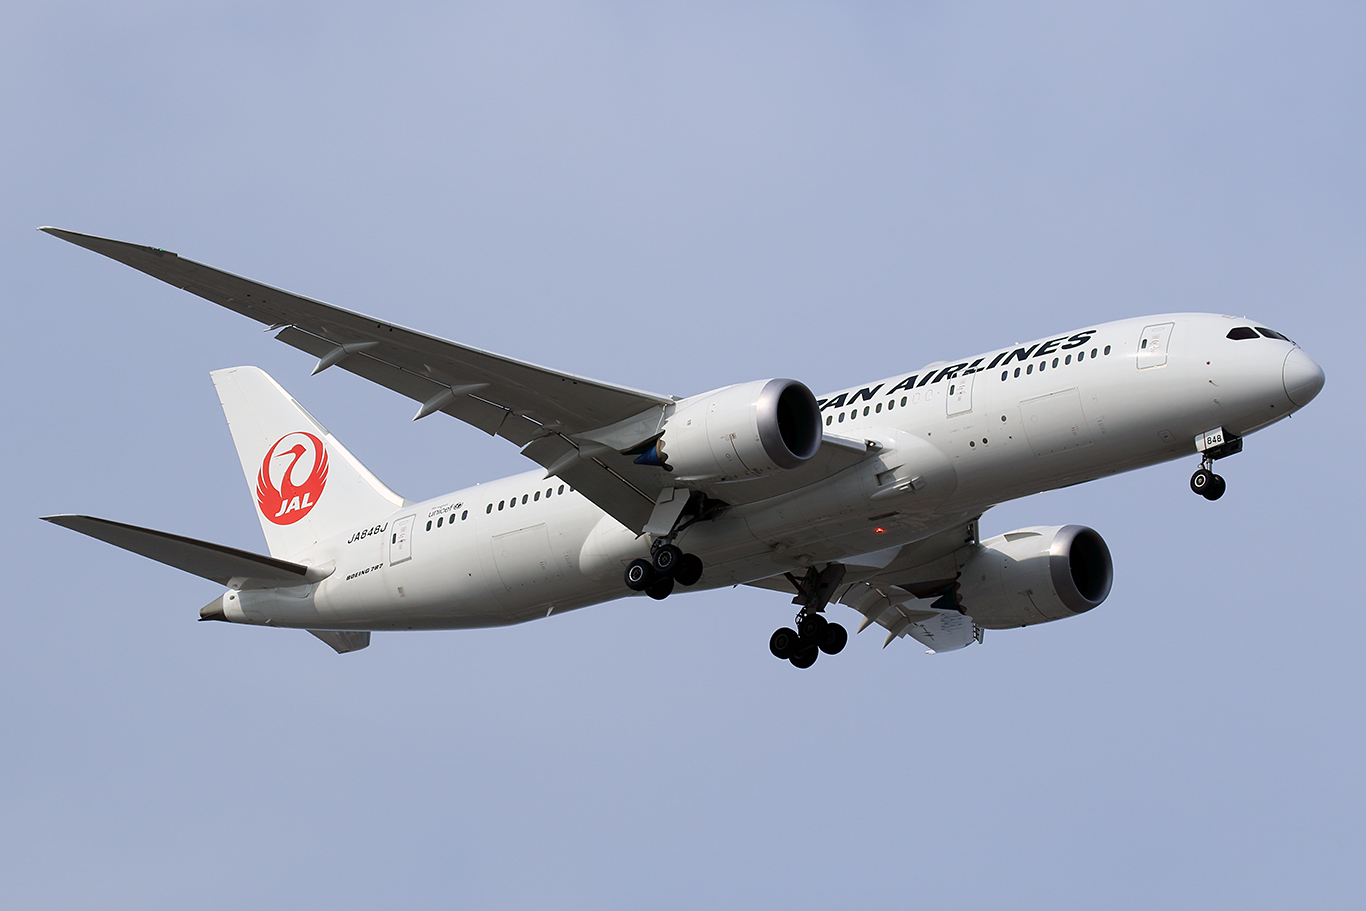 JL/JAL/日本航空 JL120 B787-8 JA848J